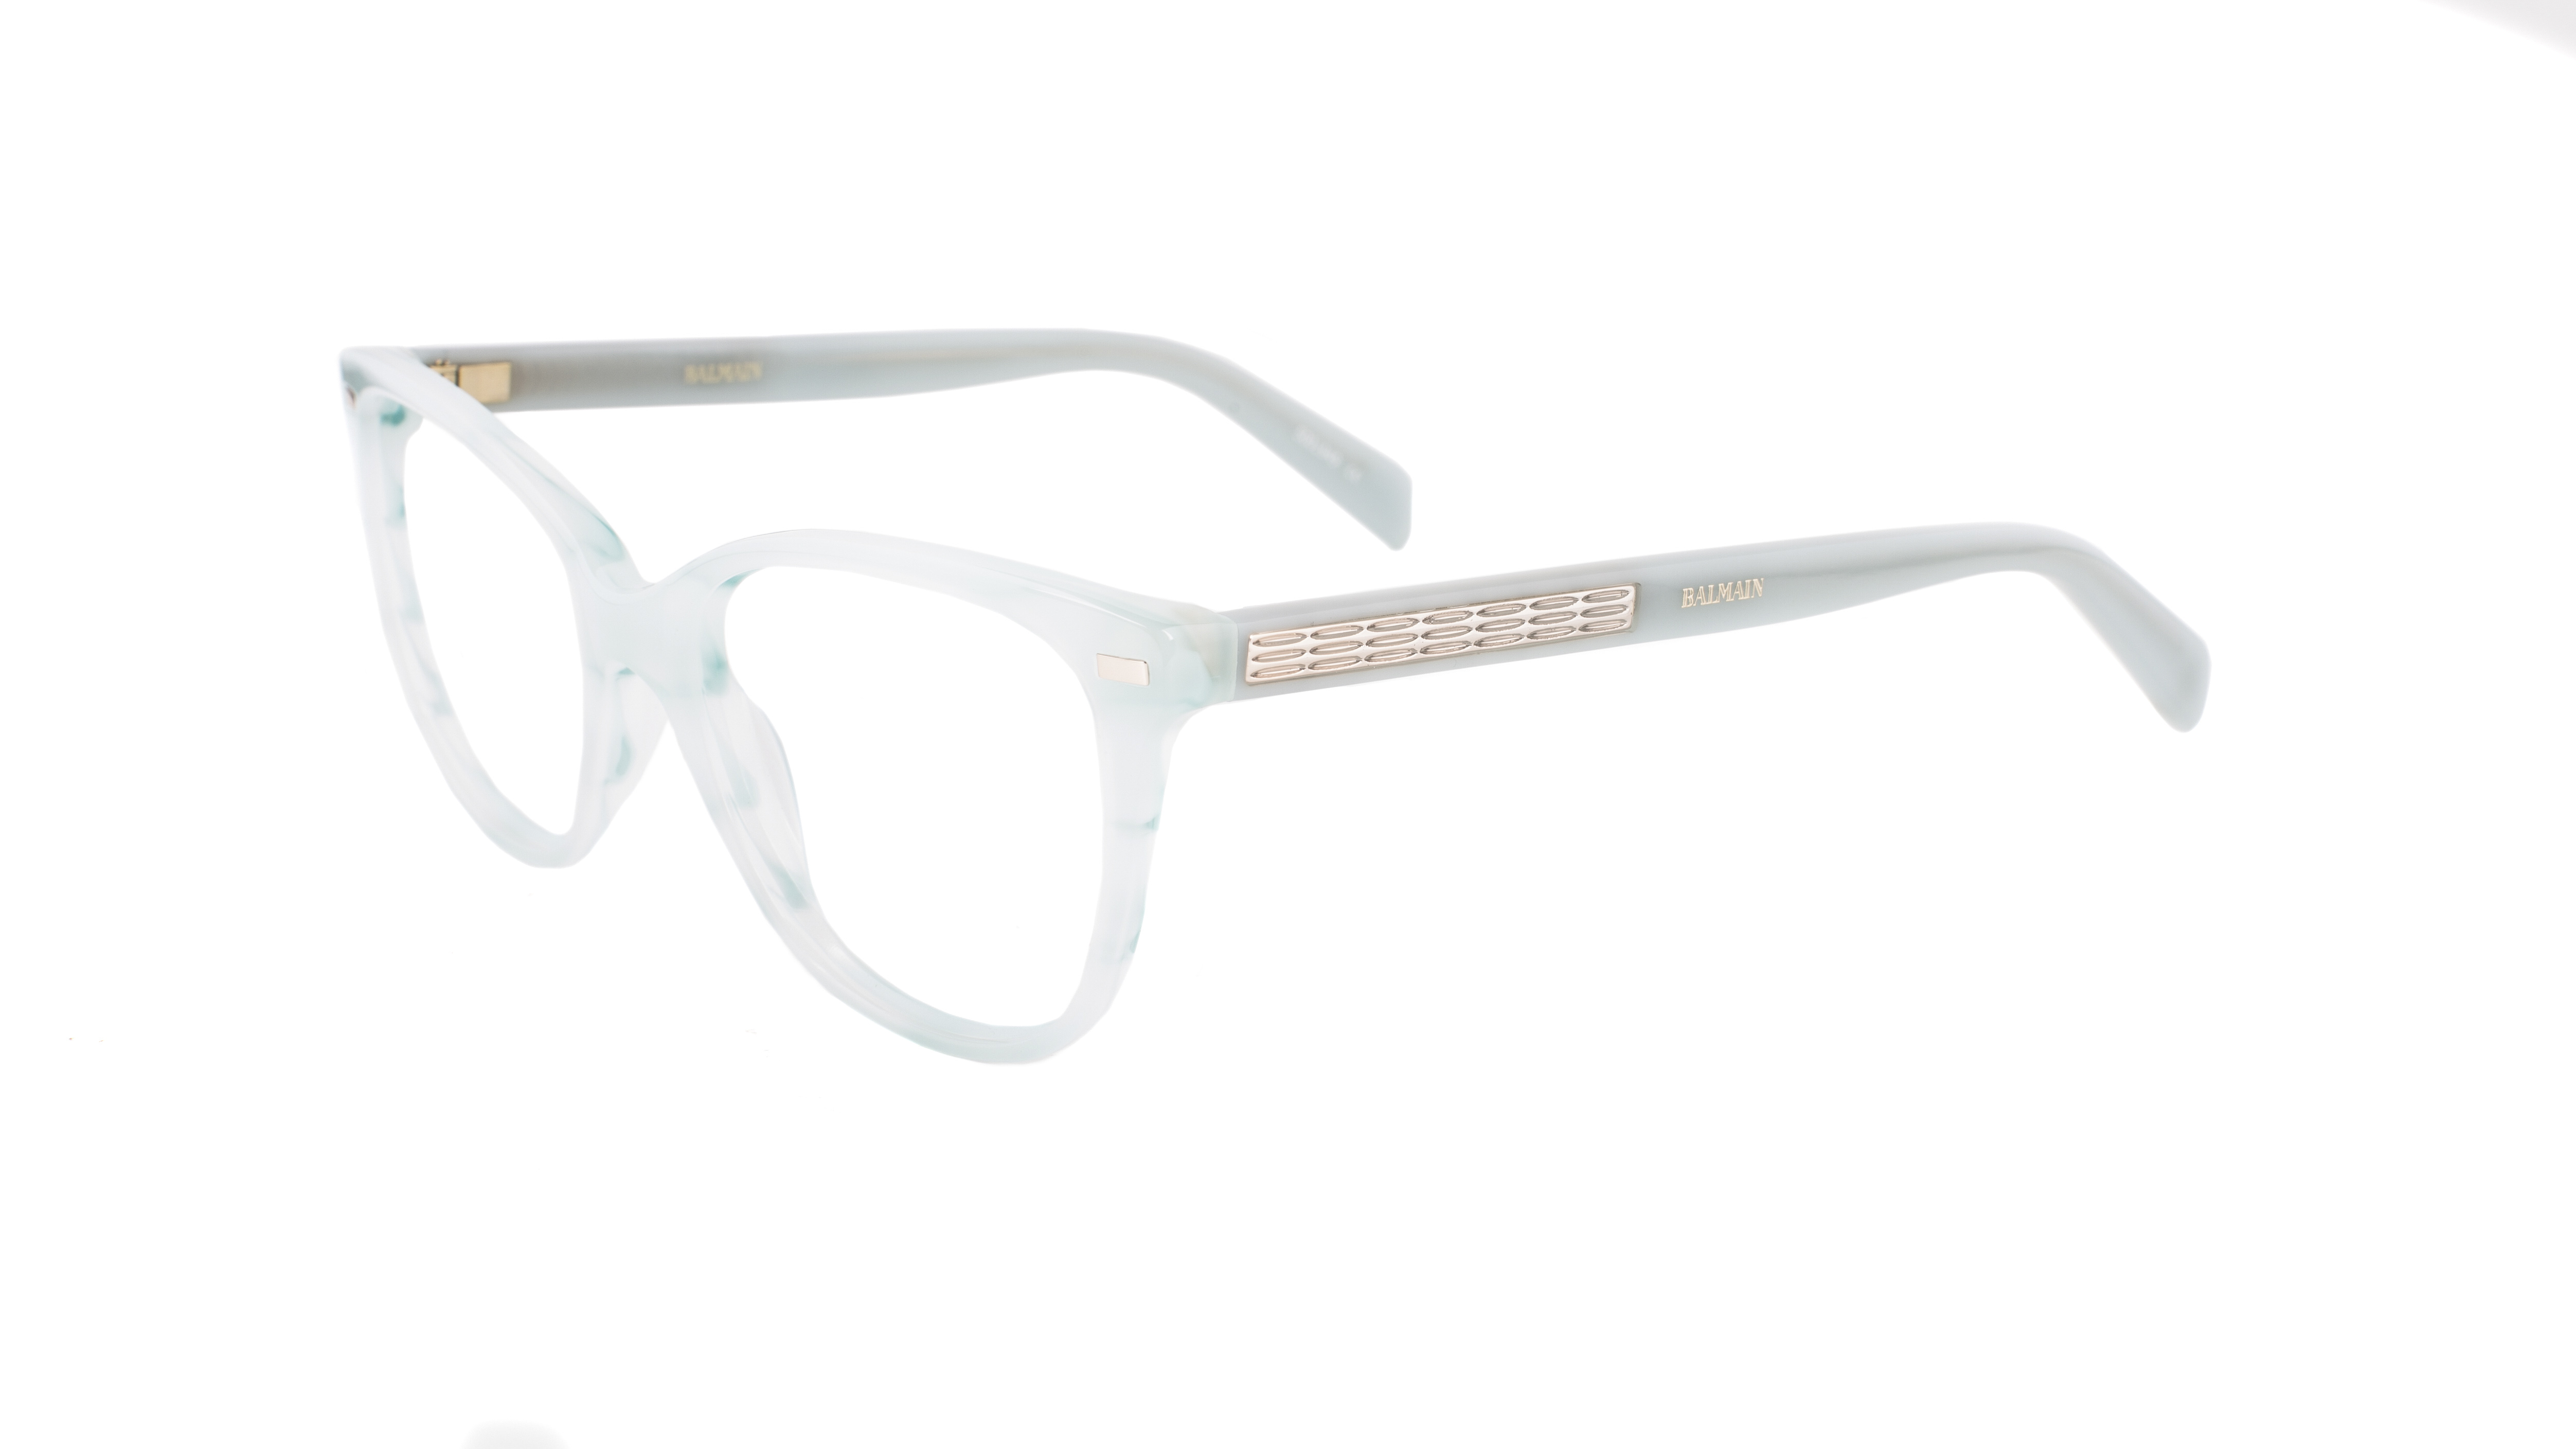 Balmain x Specsavers BL1522S 3057088- RRP 2 pairs single vision $459 (2)